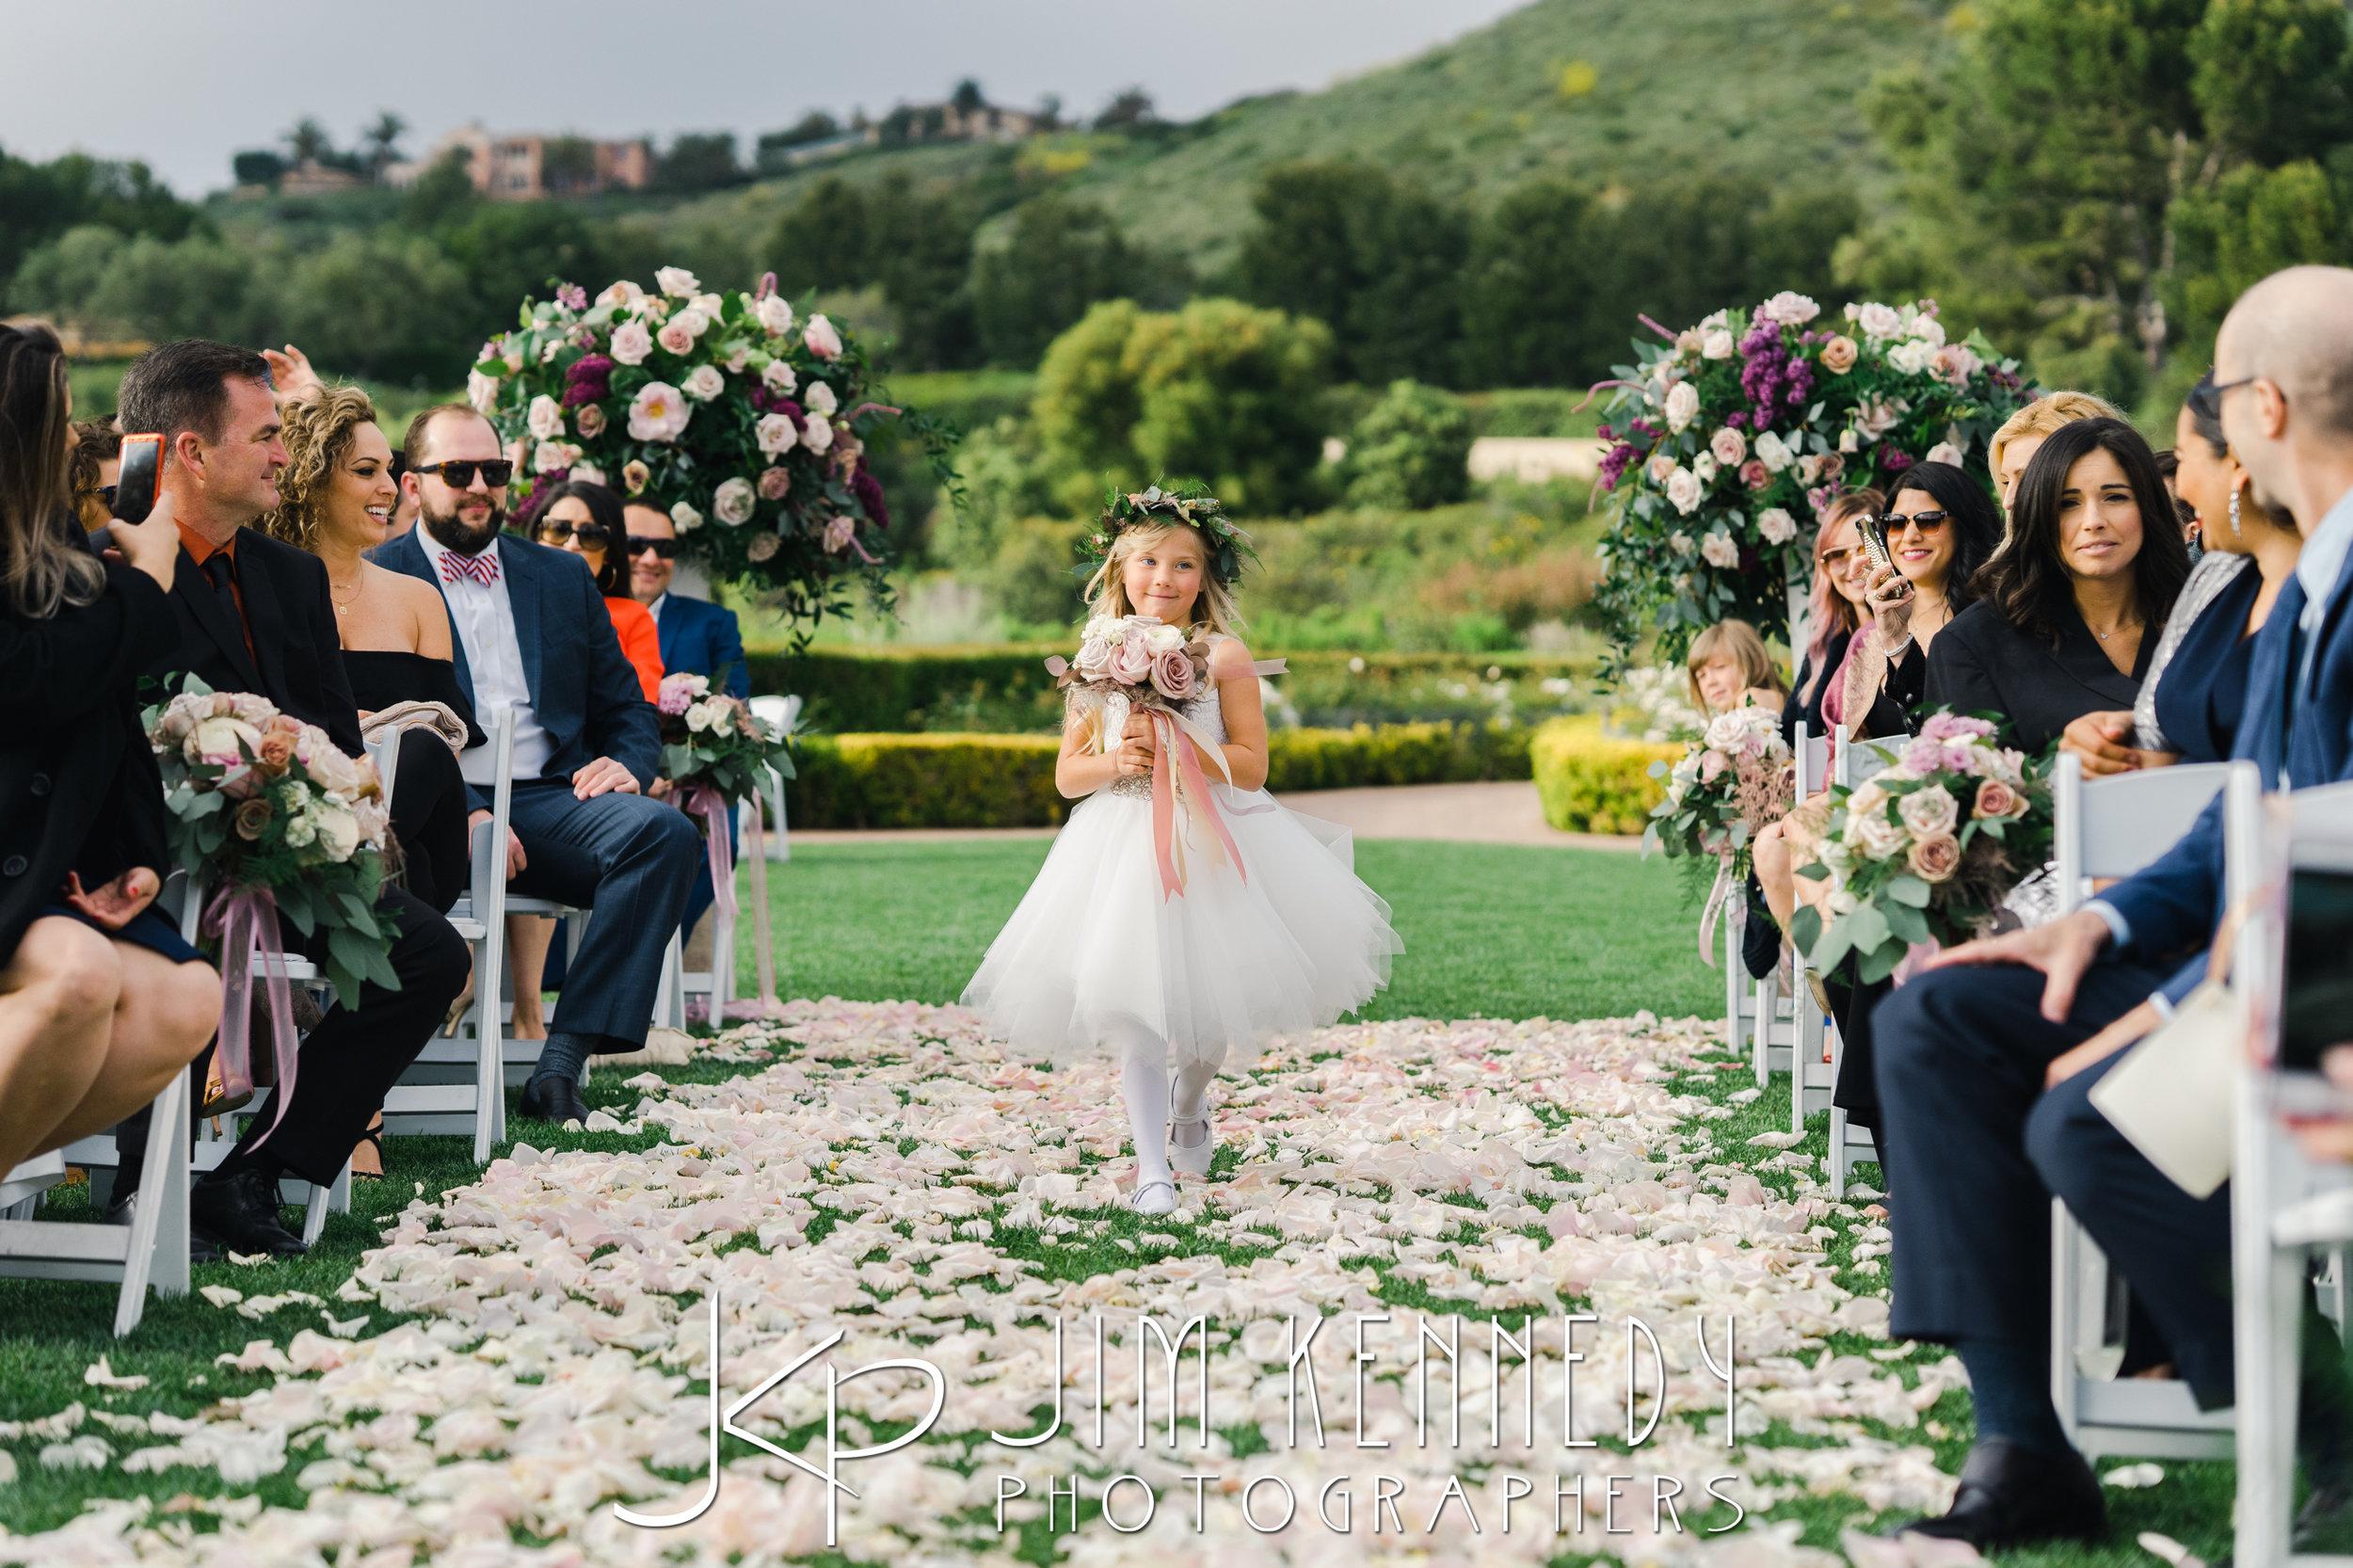 pelican-hill-wedding-jim-kenedy-photographers_0108.JPG